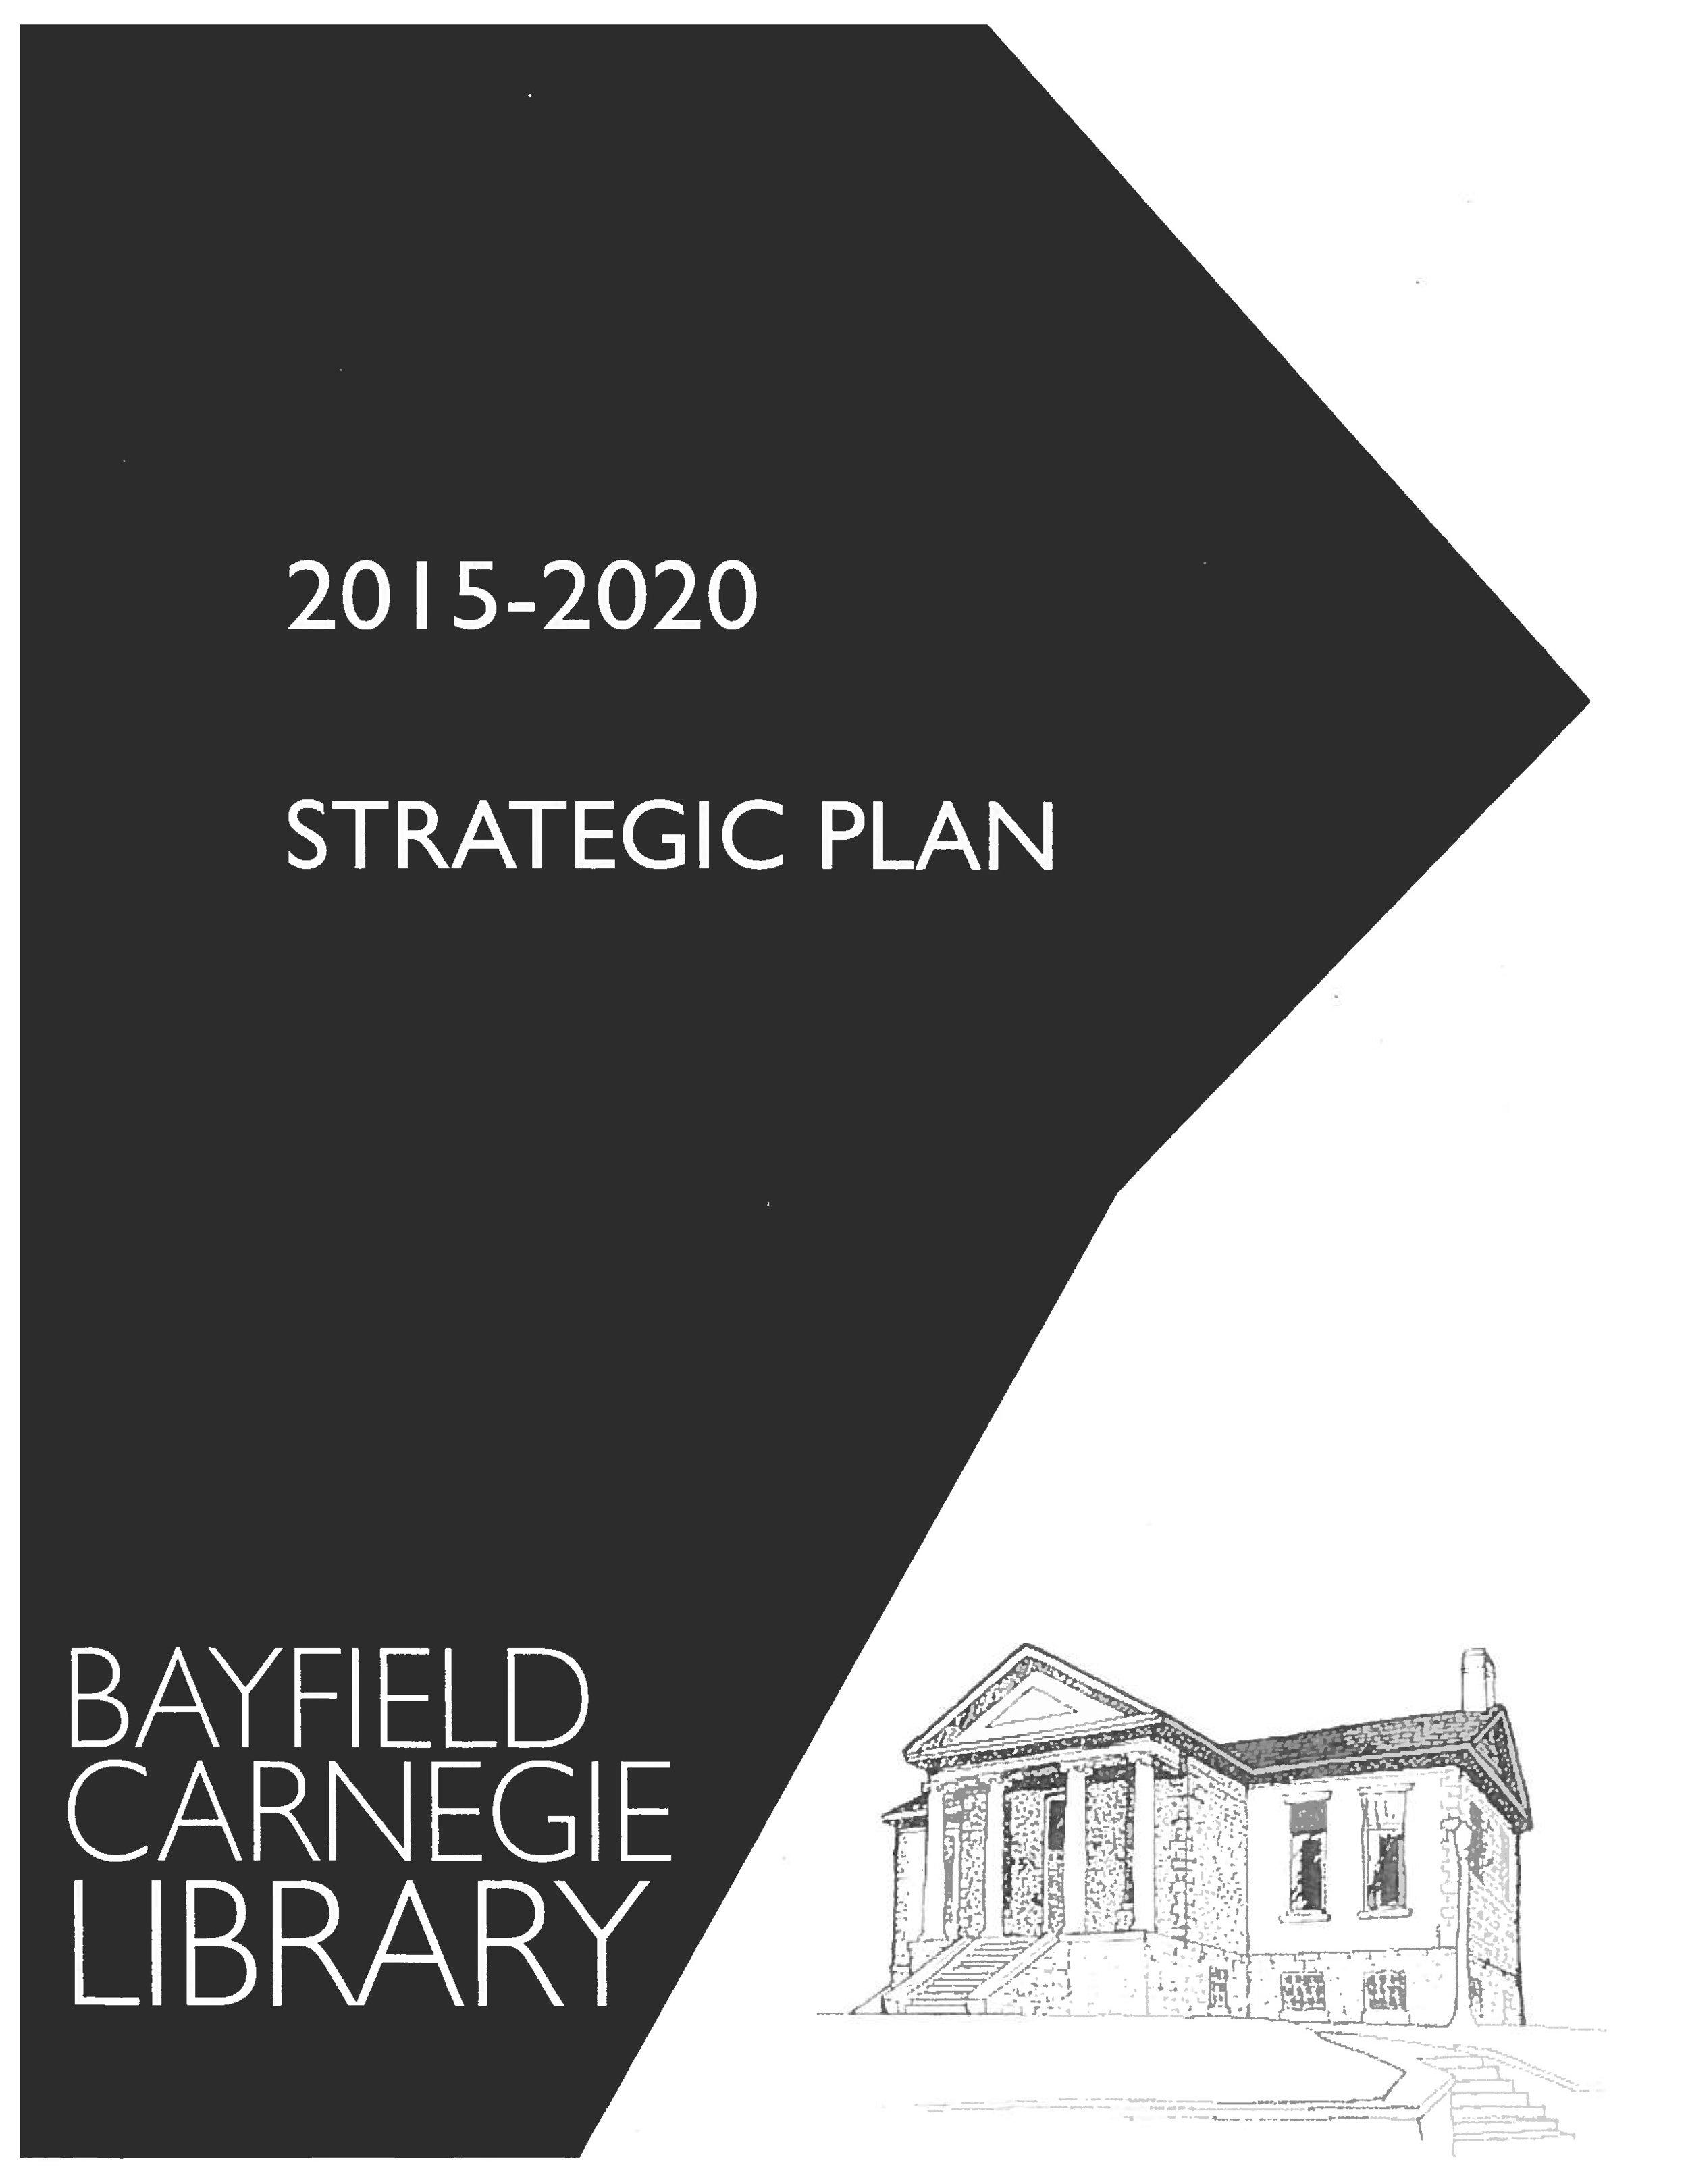 2015-2020 Stategic Plan-HRK 2016 grant_Page_01.jpg